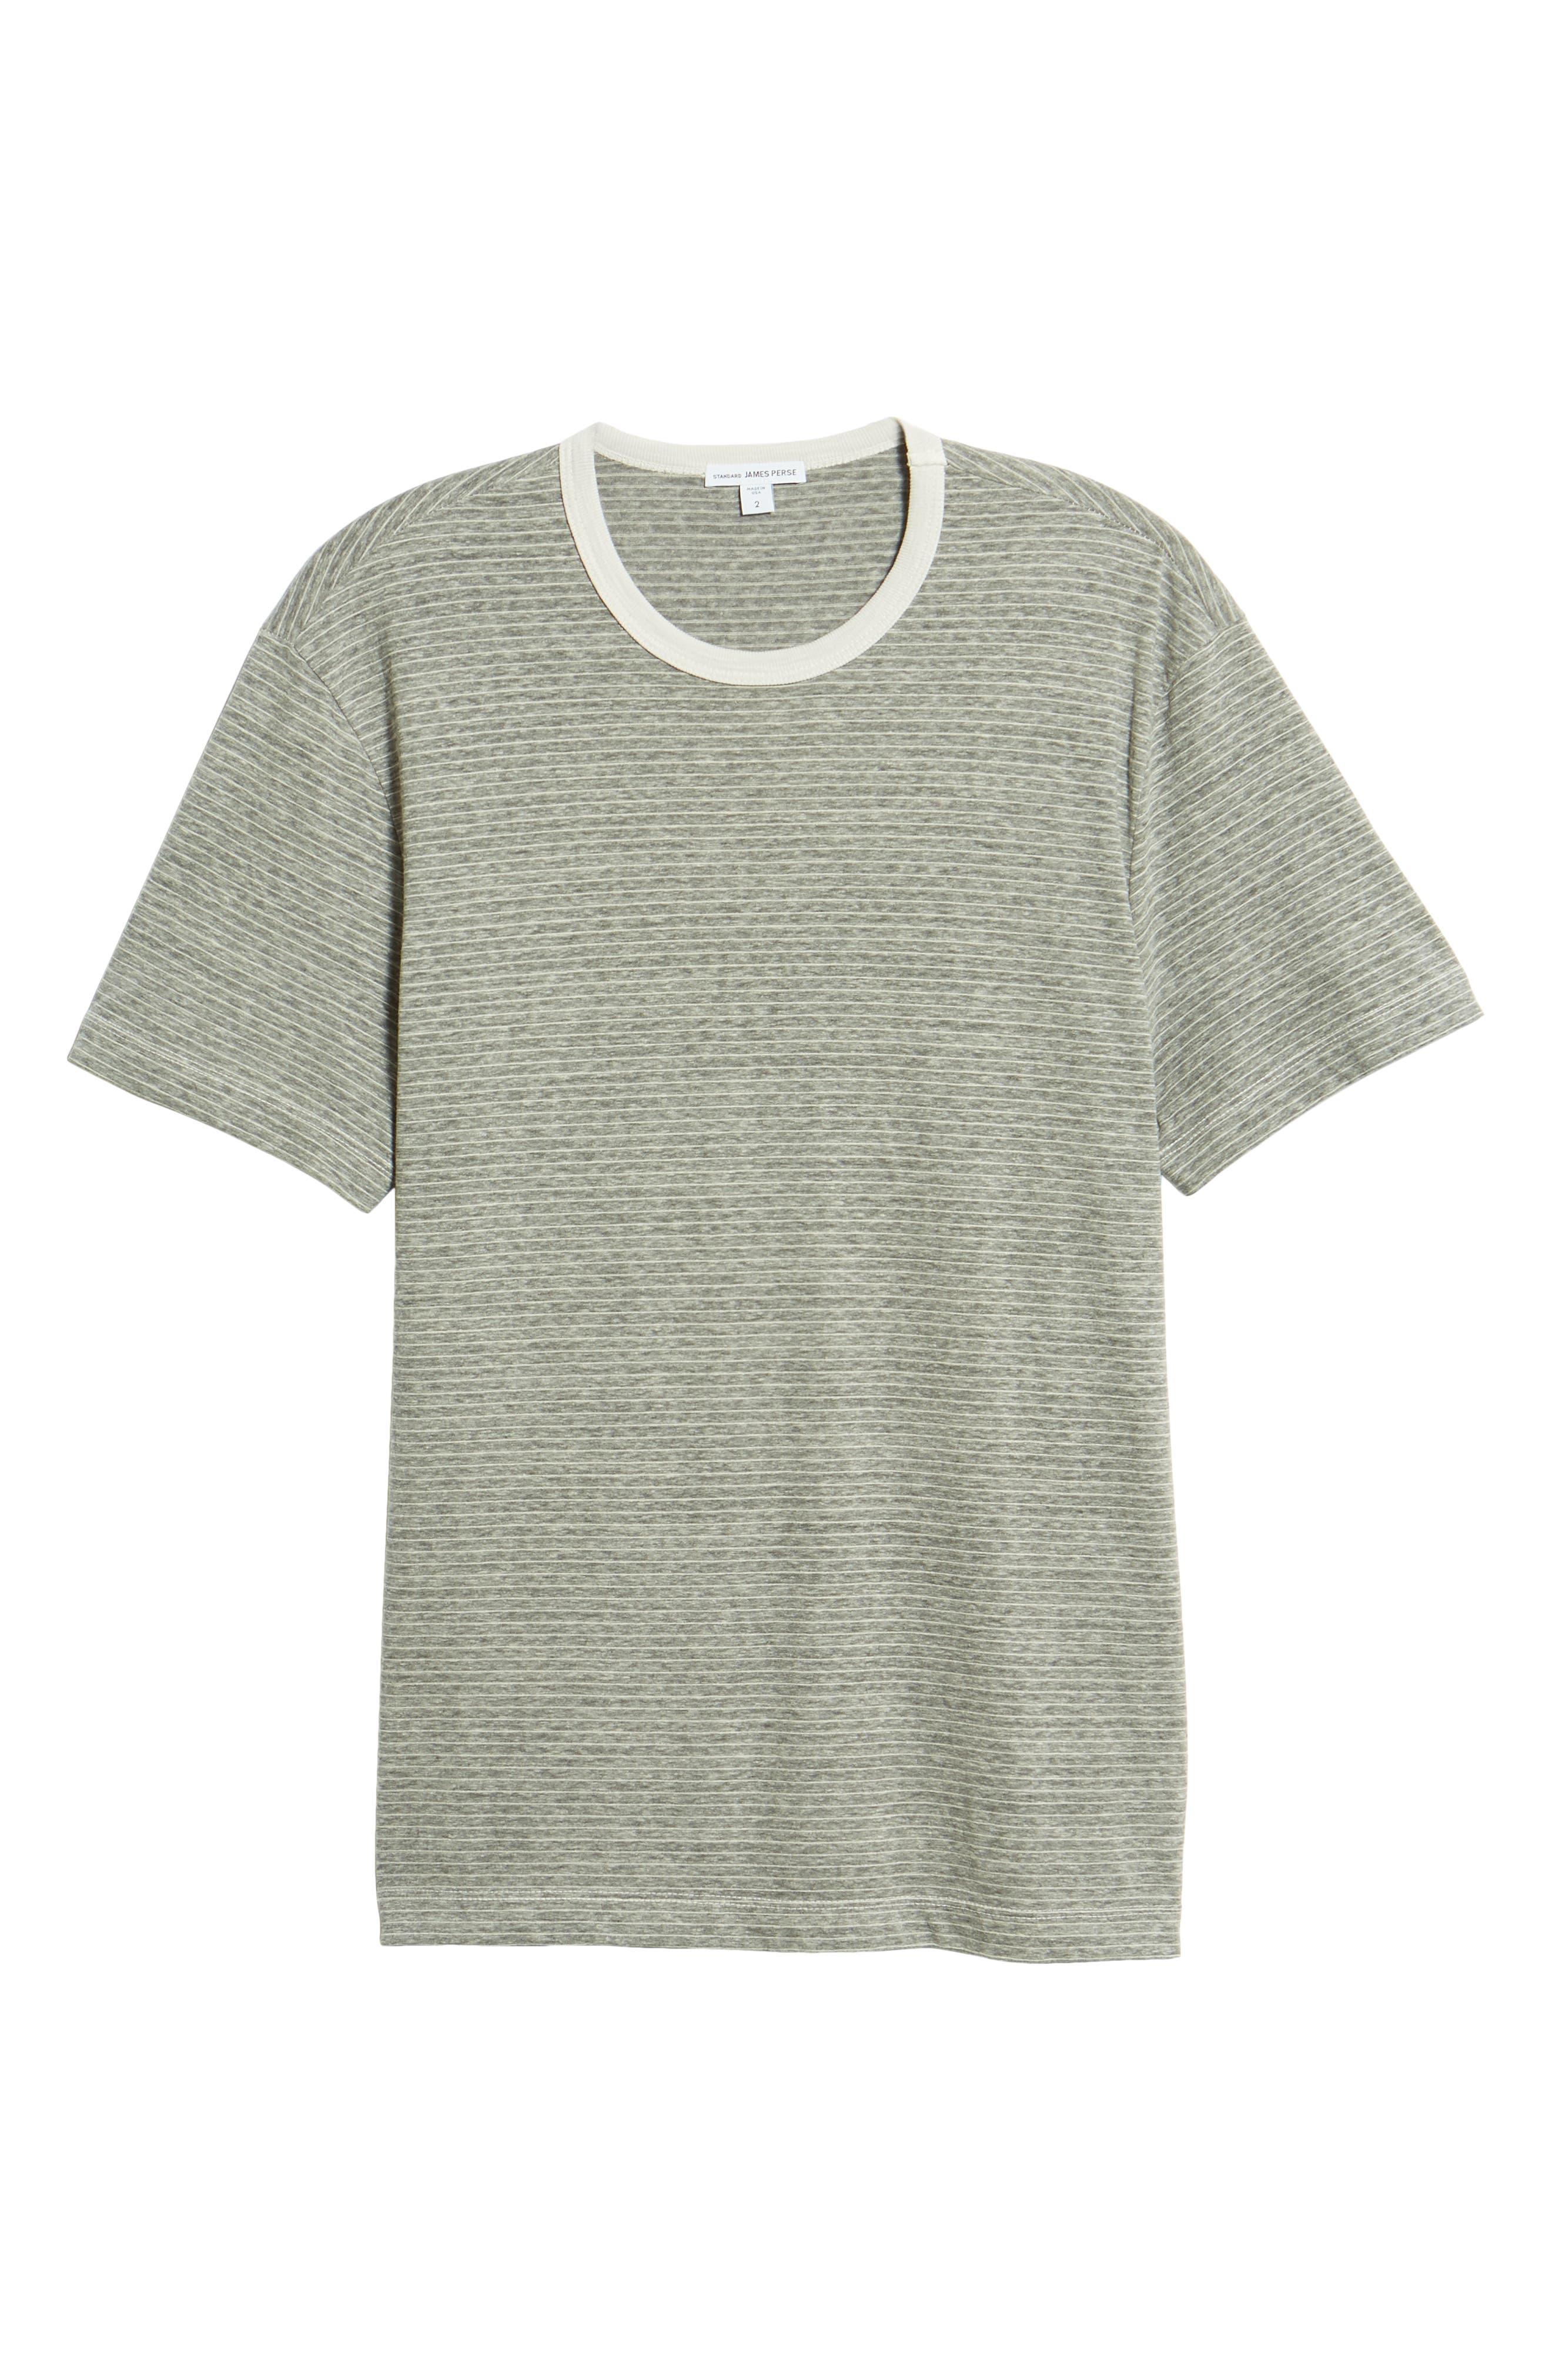 Microstripe Ringer T-Shirt,                             Alternate thumbnail 6, color,                             MEMORY PIGMENT